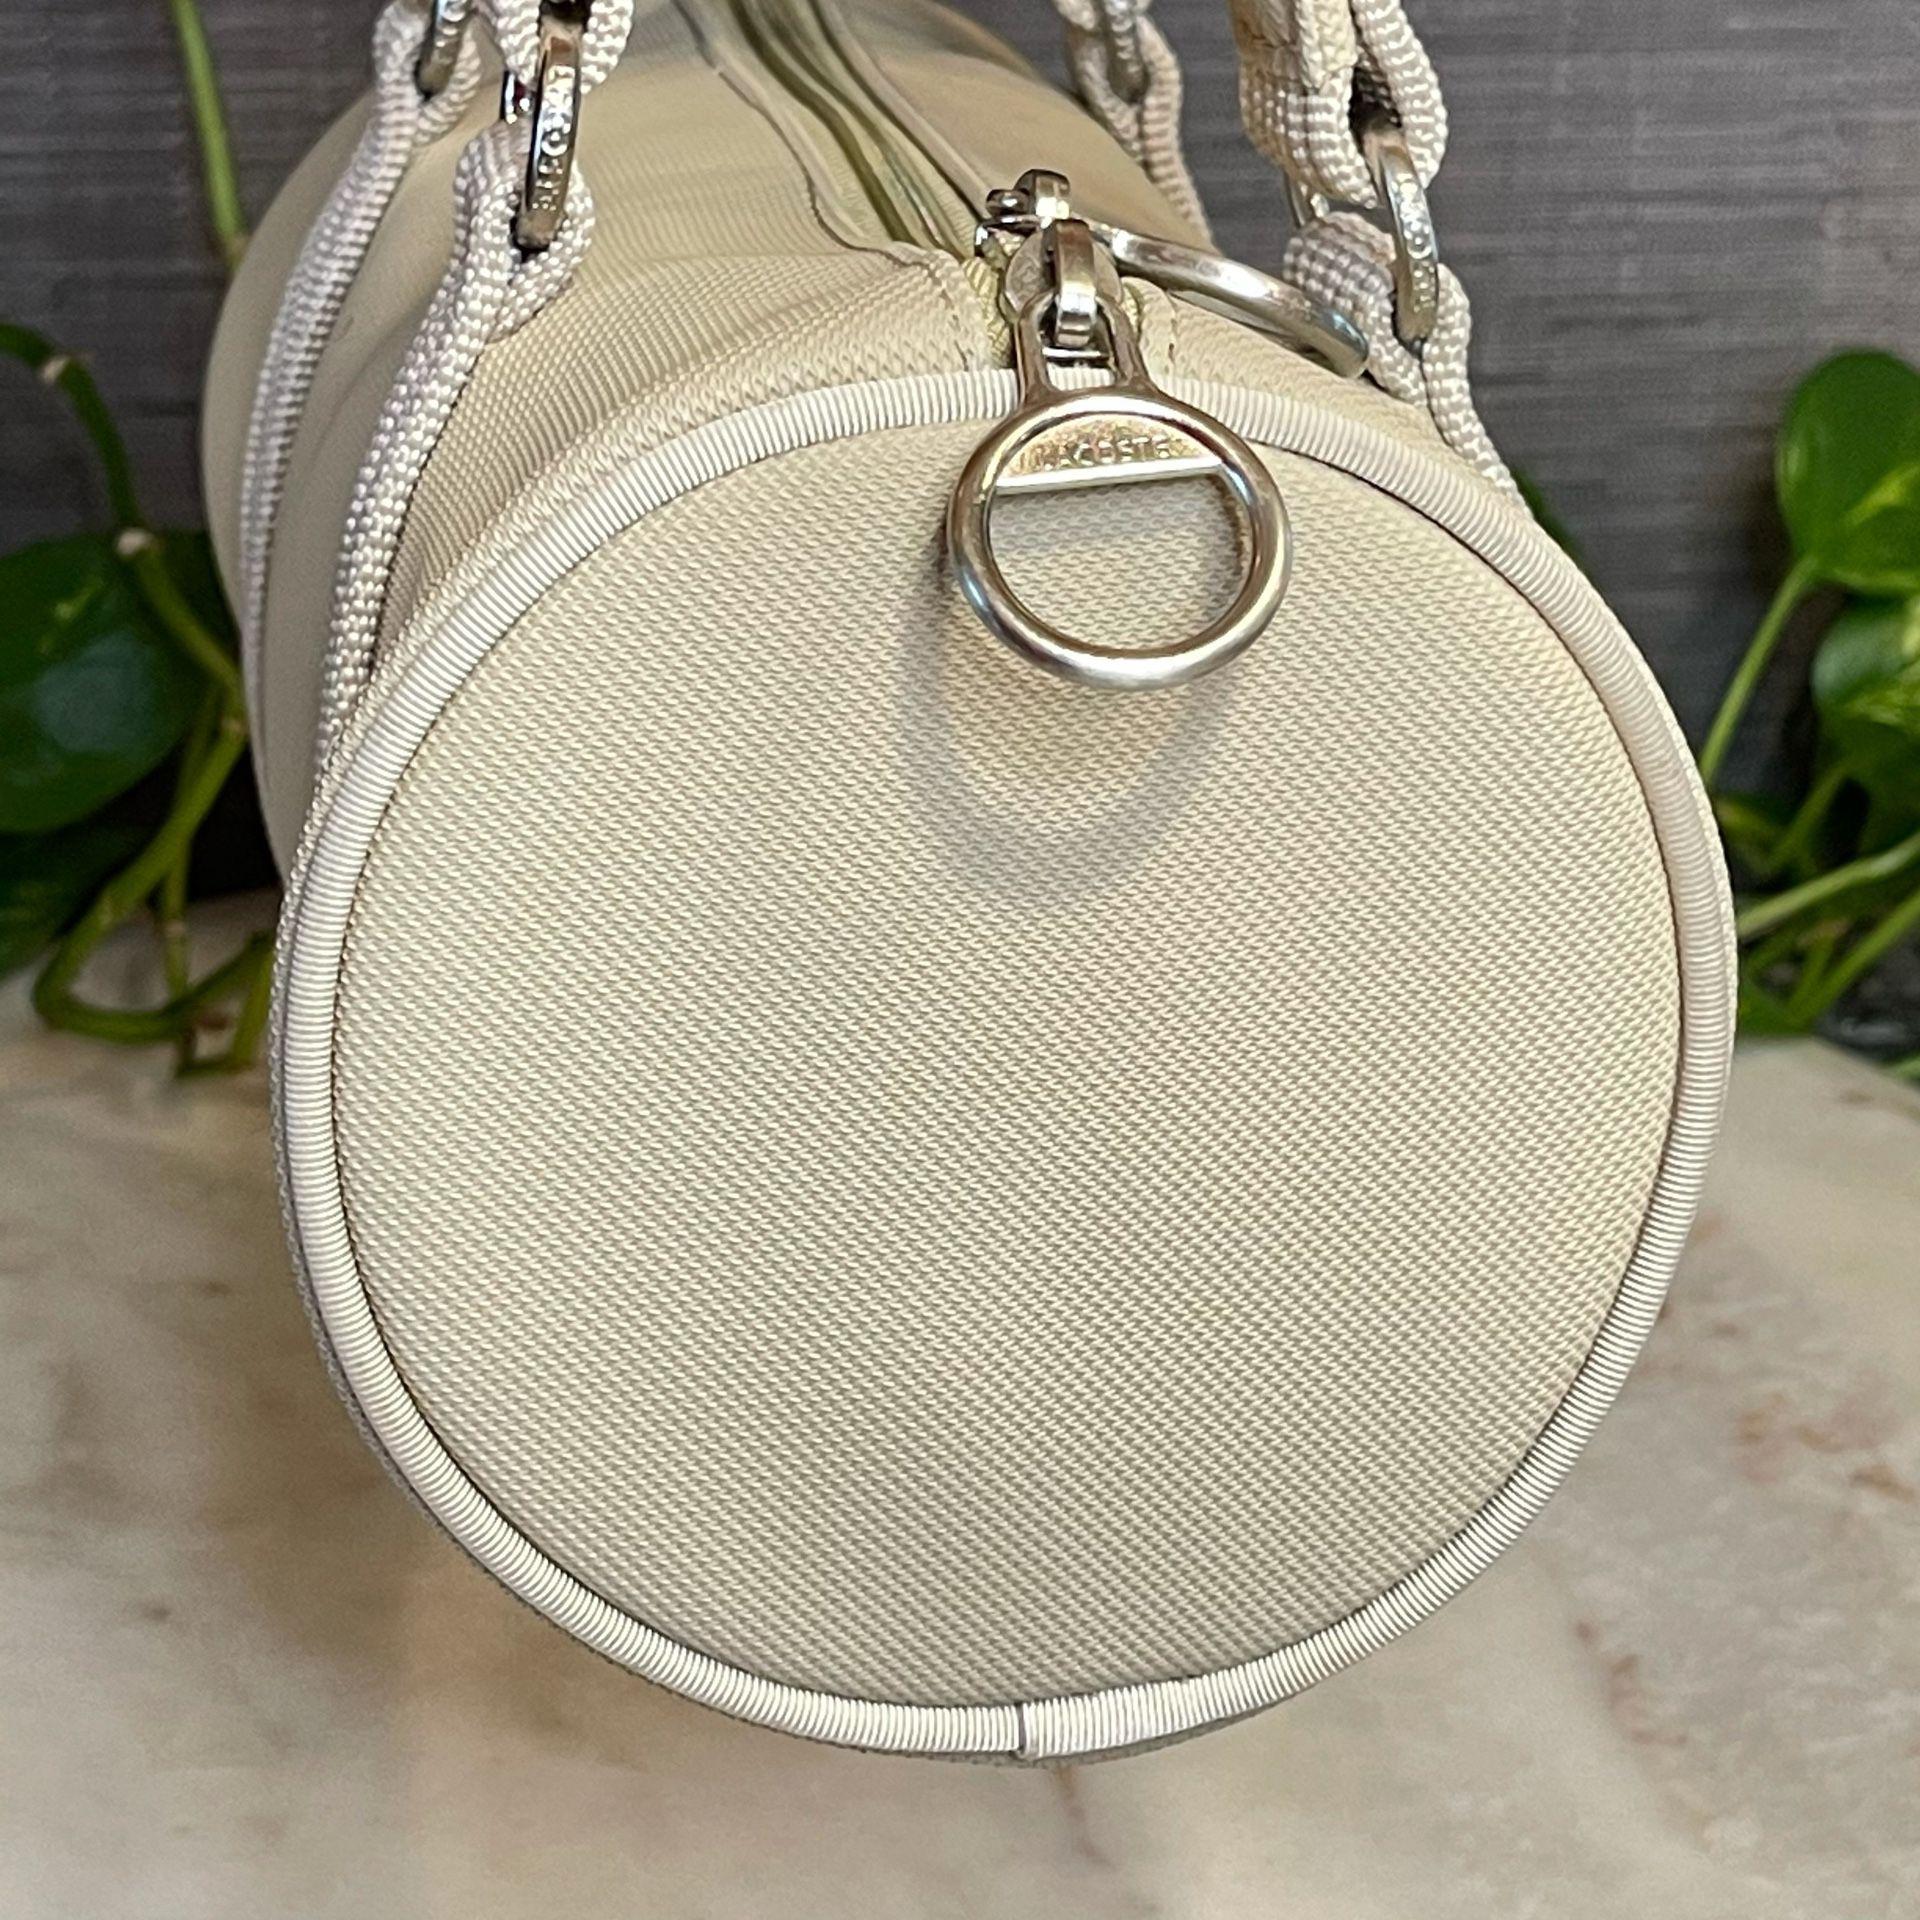 LACOSTE Summer Sand Roll Bag Khaki Bag NWOT